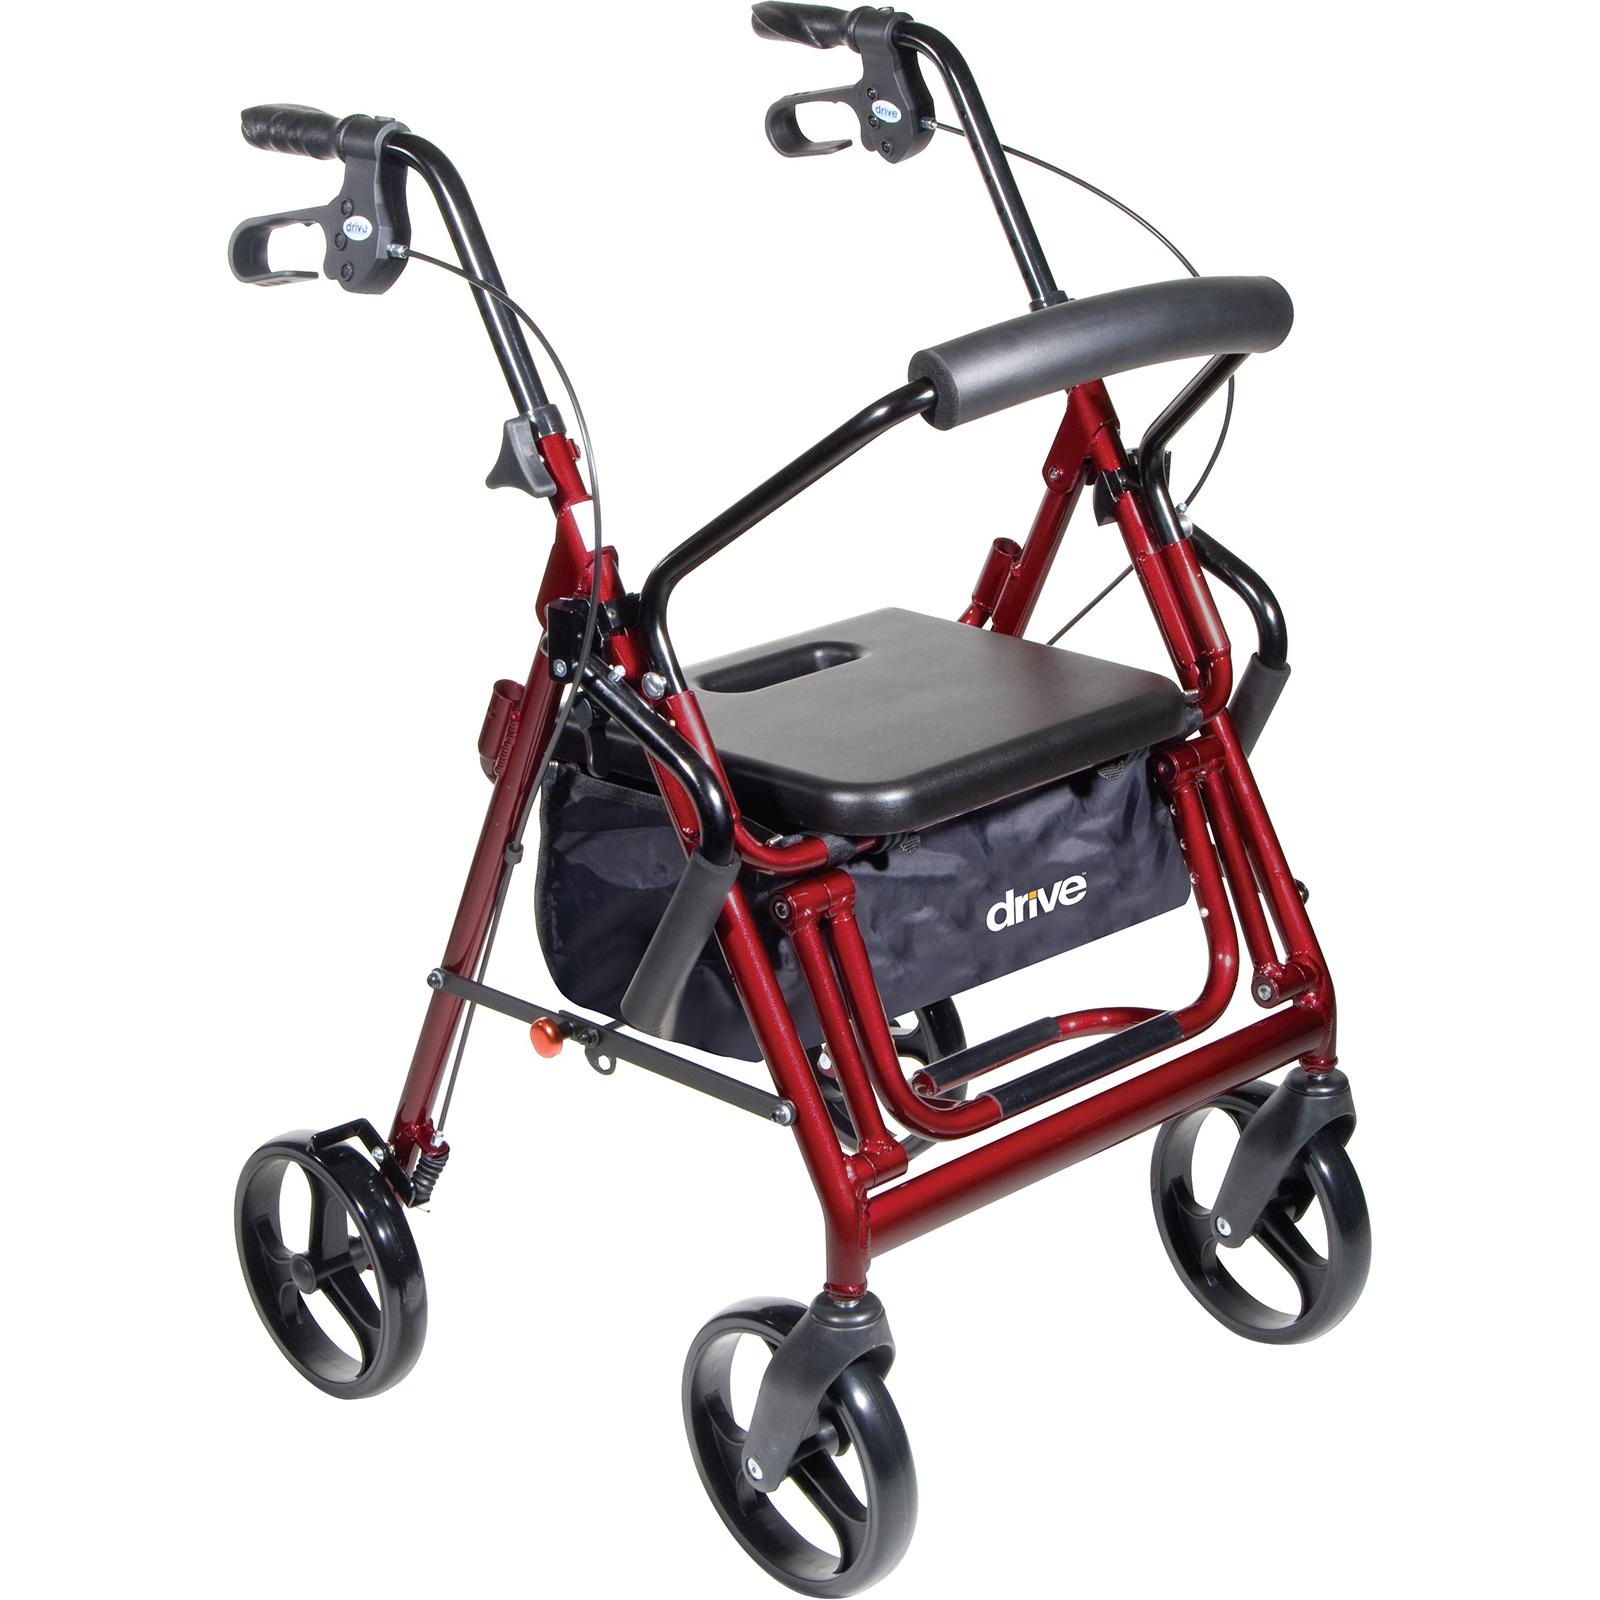 Interchangeable Walker Wheelchairs